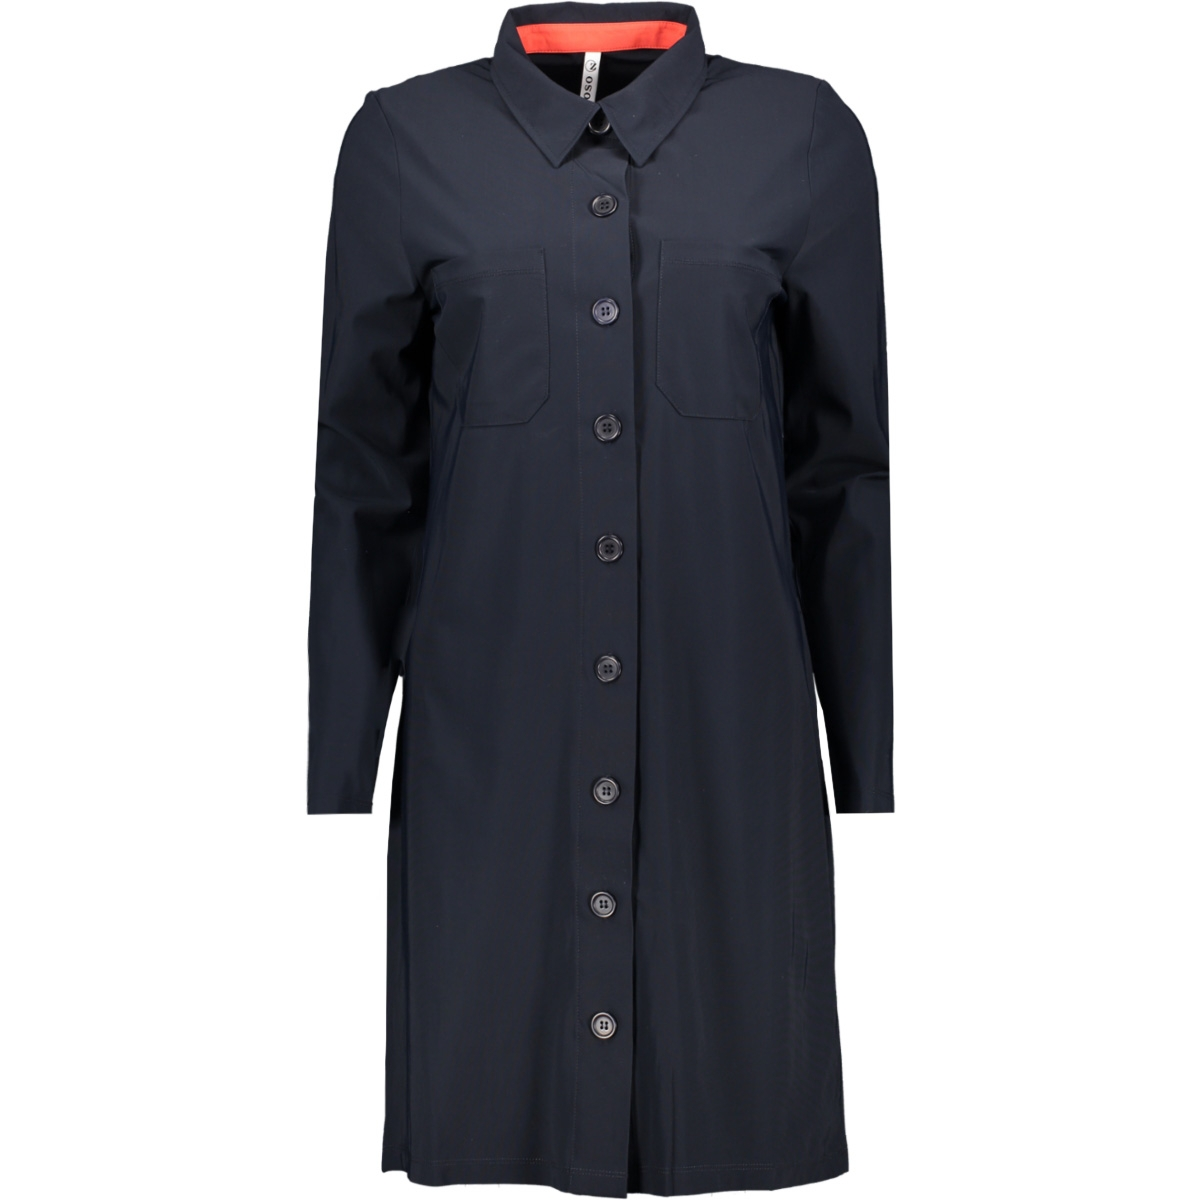 travel long blouse hr1935 zoso jurk navy/orange red